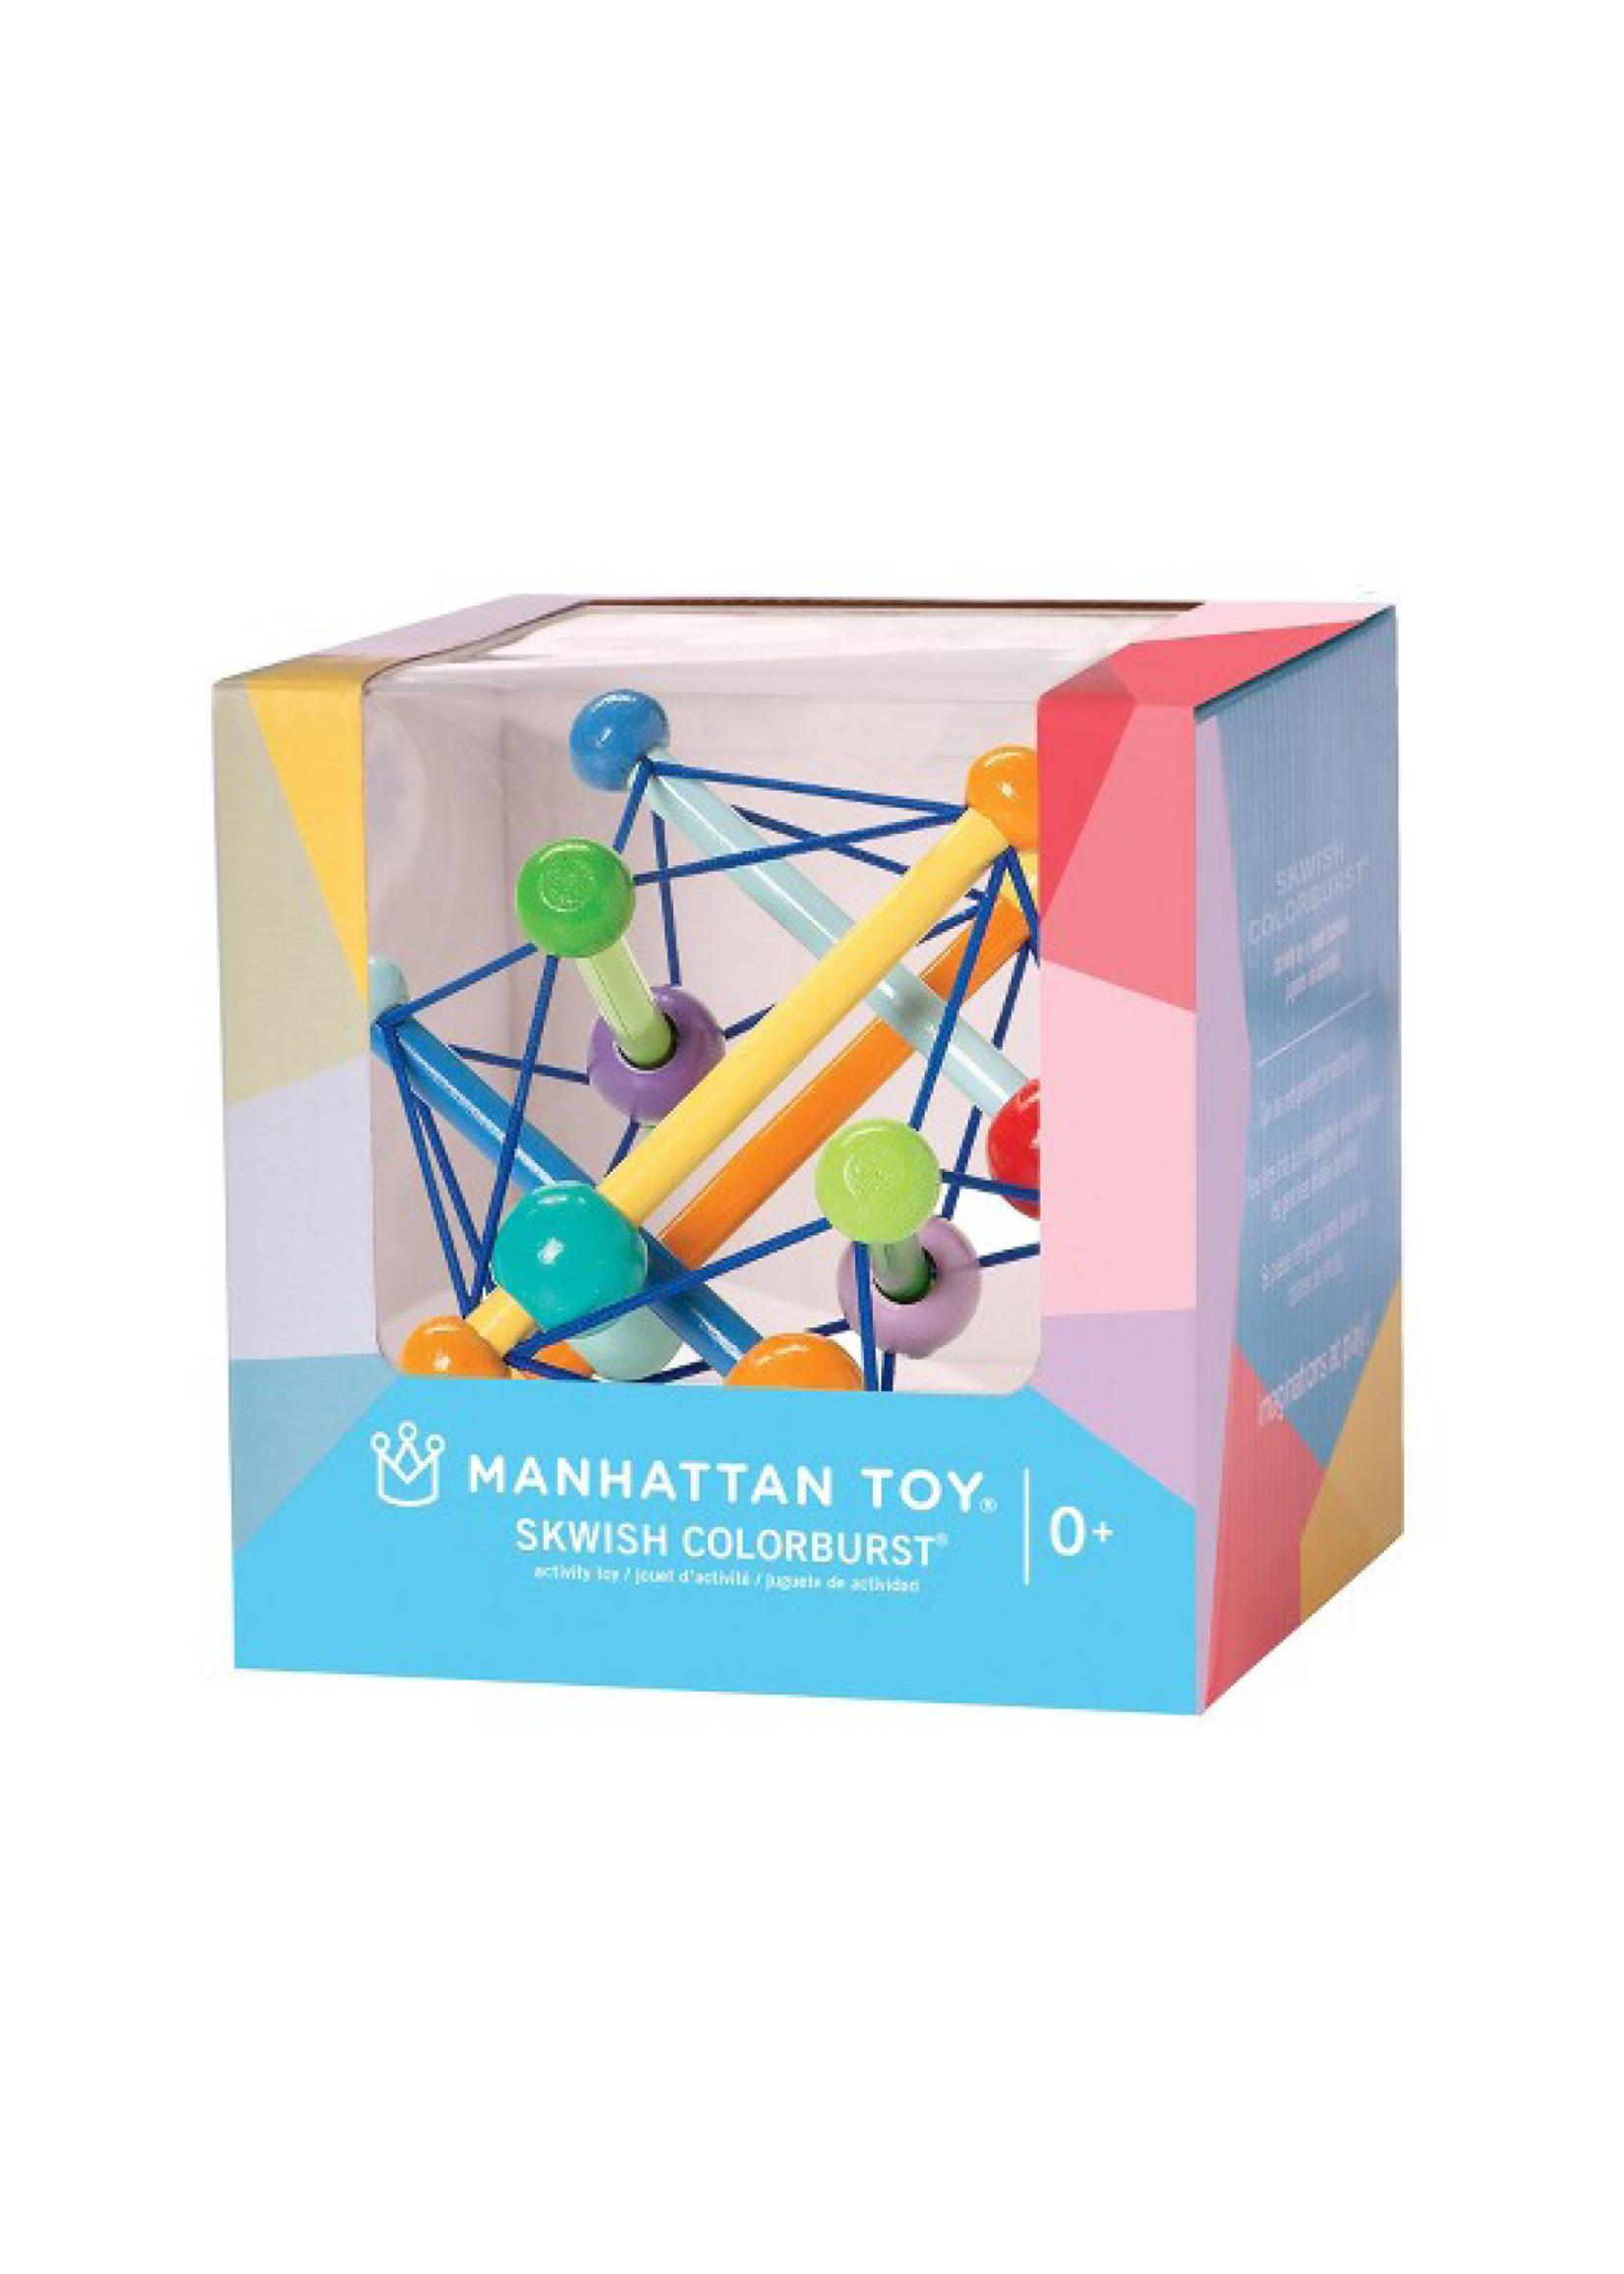 Manhattan Toy Skwish Color Burst Boxed